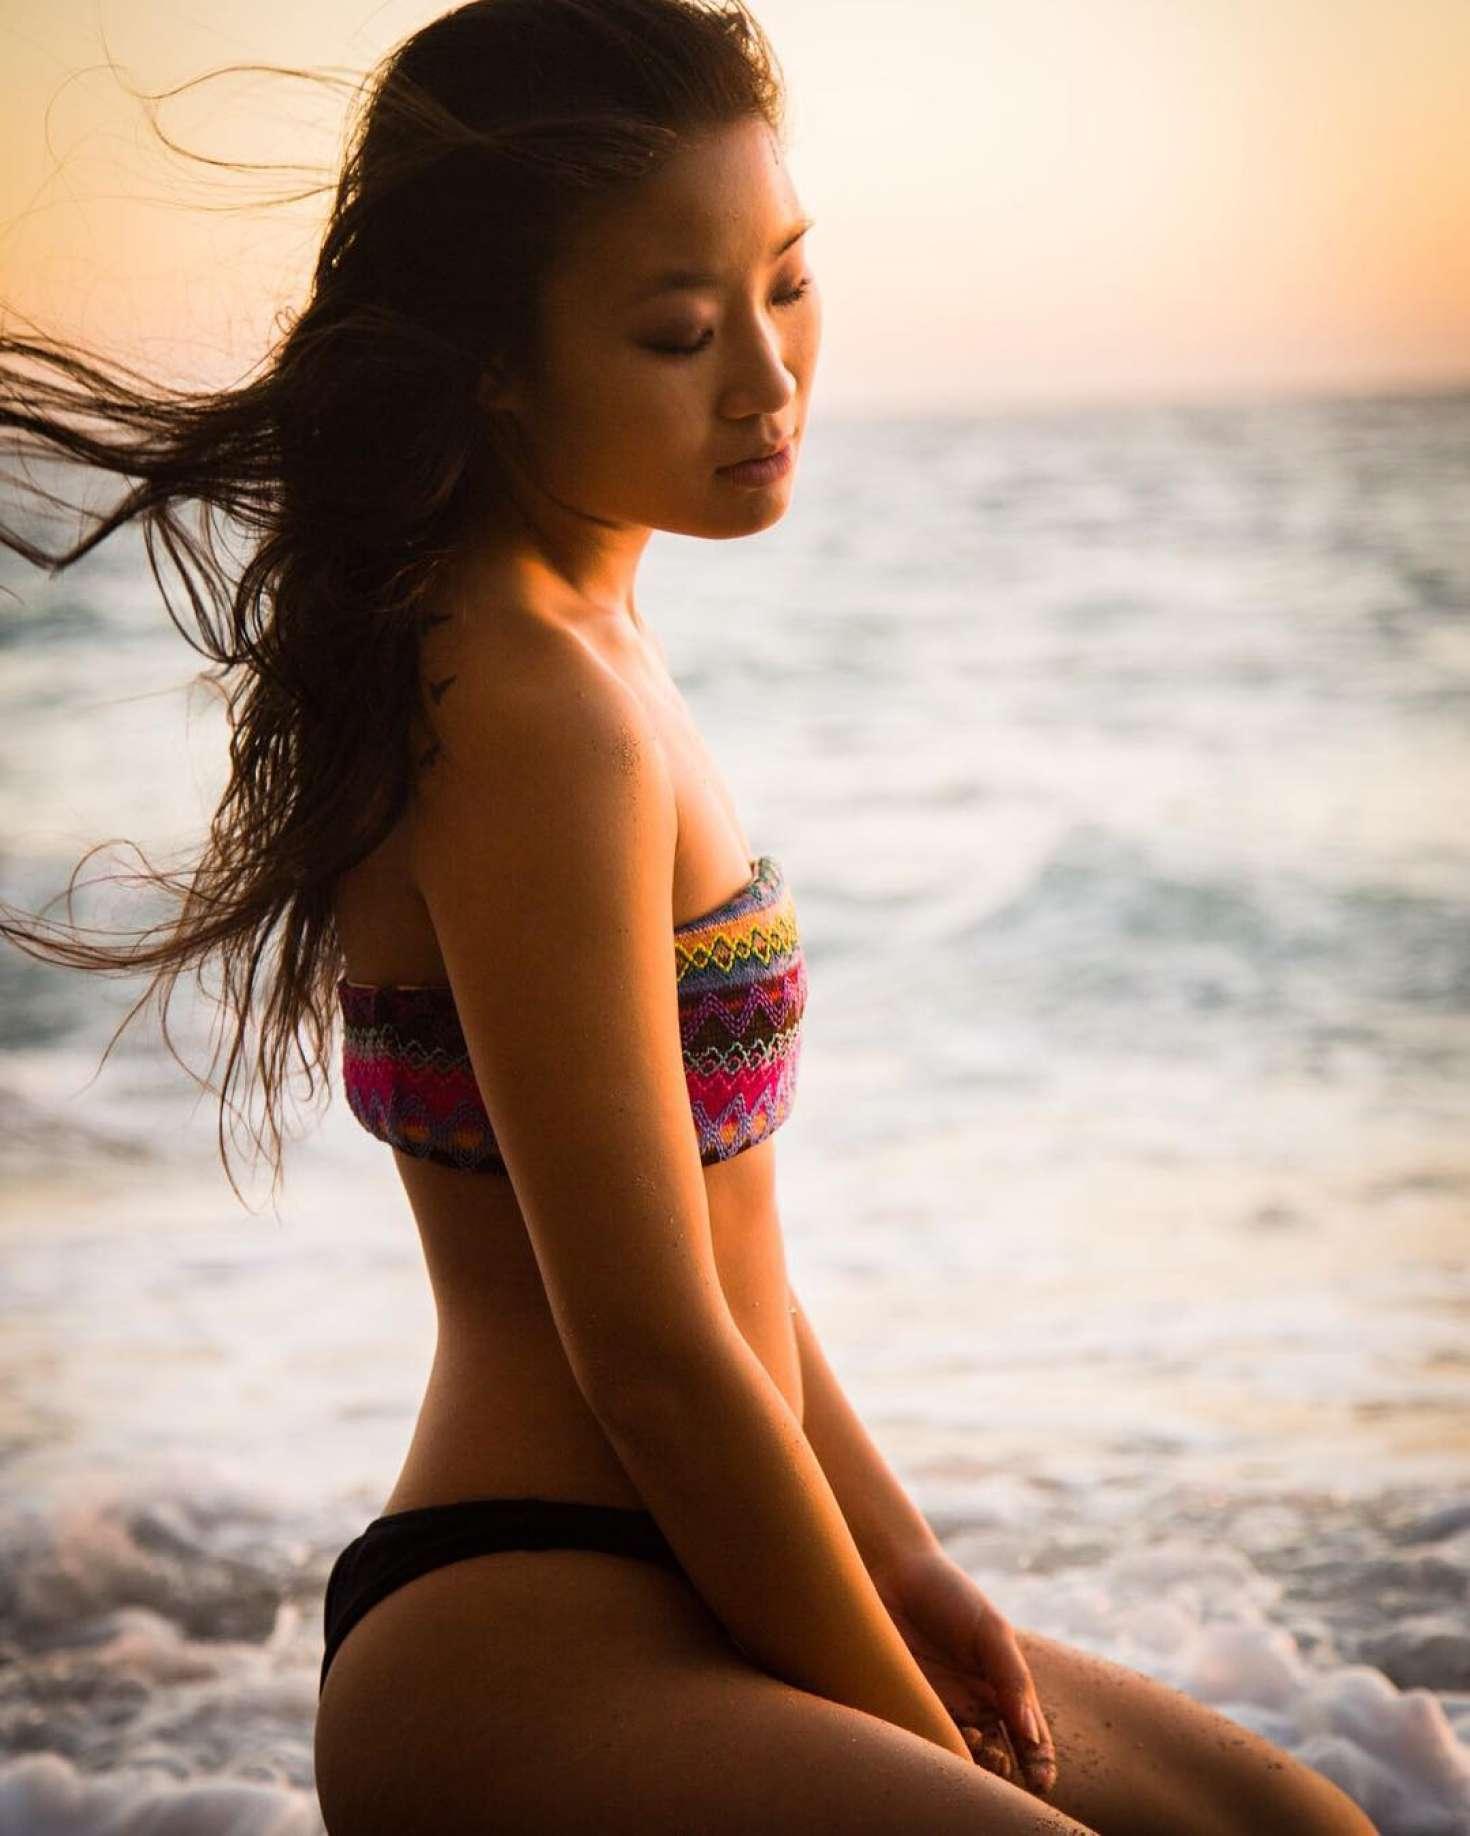 Bikini Jeannie Mai nude photos 2019